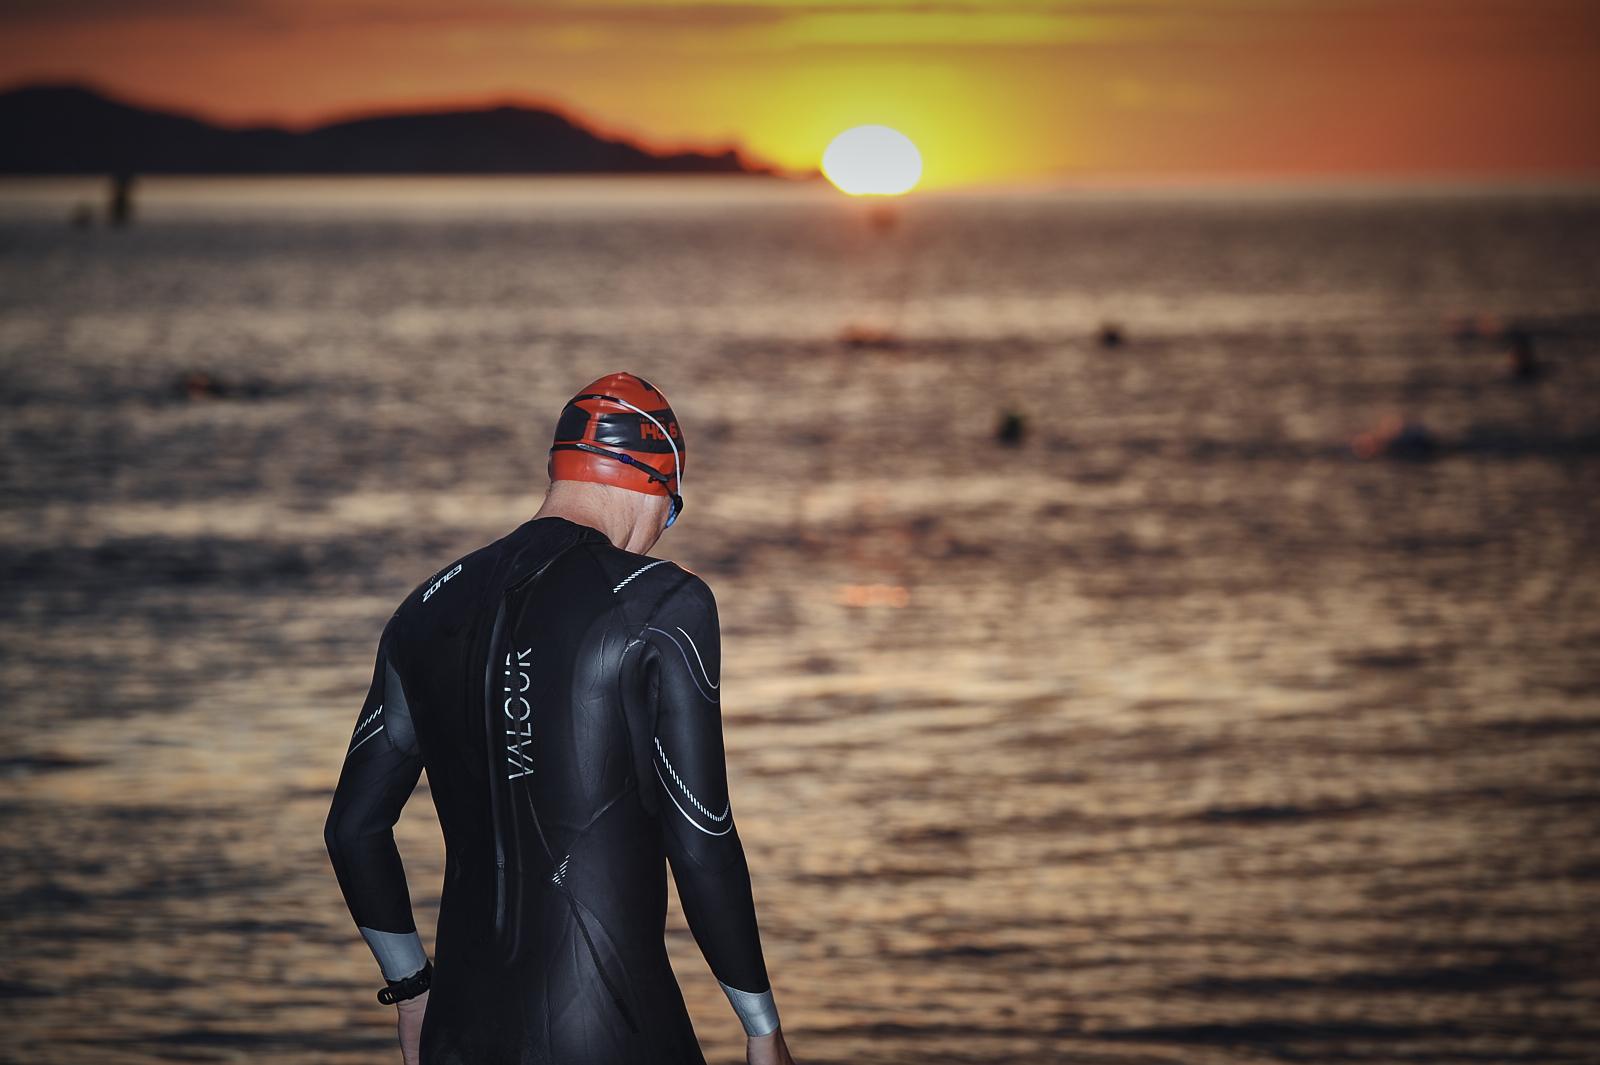 Triathlon 140.6INN 2021 - QuieroMisFotos.com - Sergio Tomico, Photography